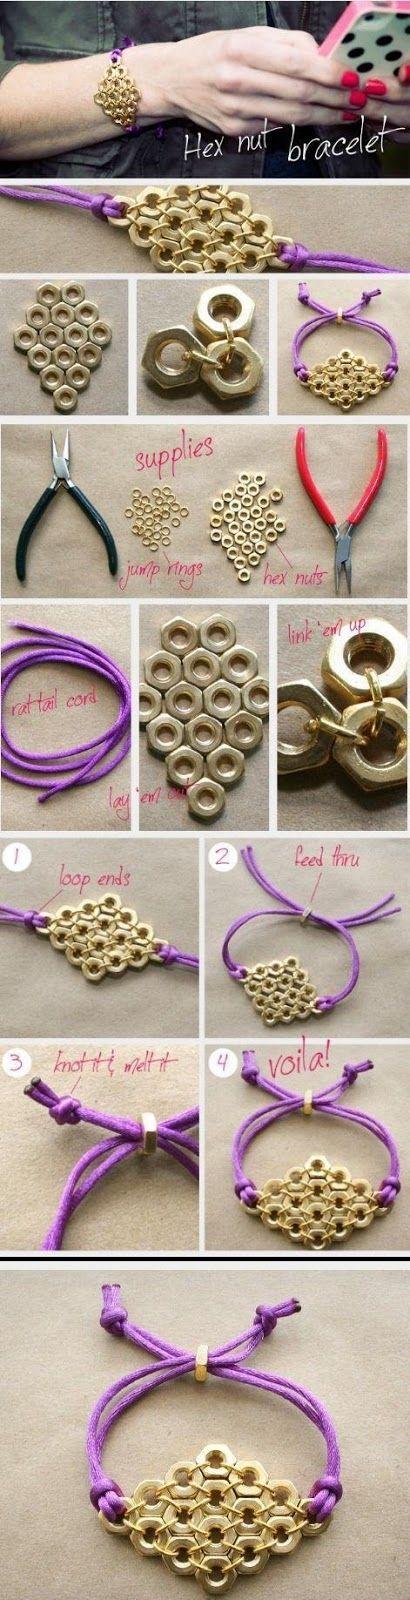 DIY Hex Nut Bracelet diy crafts craft ideas easy crafts diy ideas crafty easy…